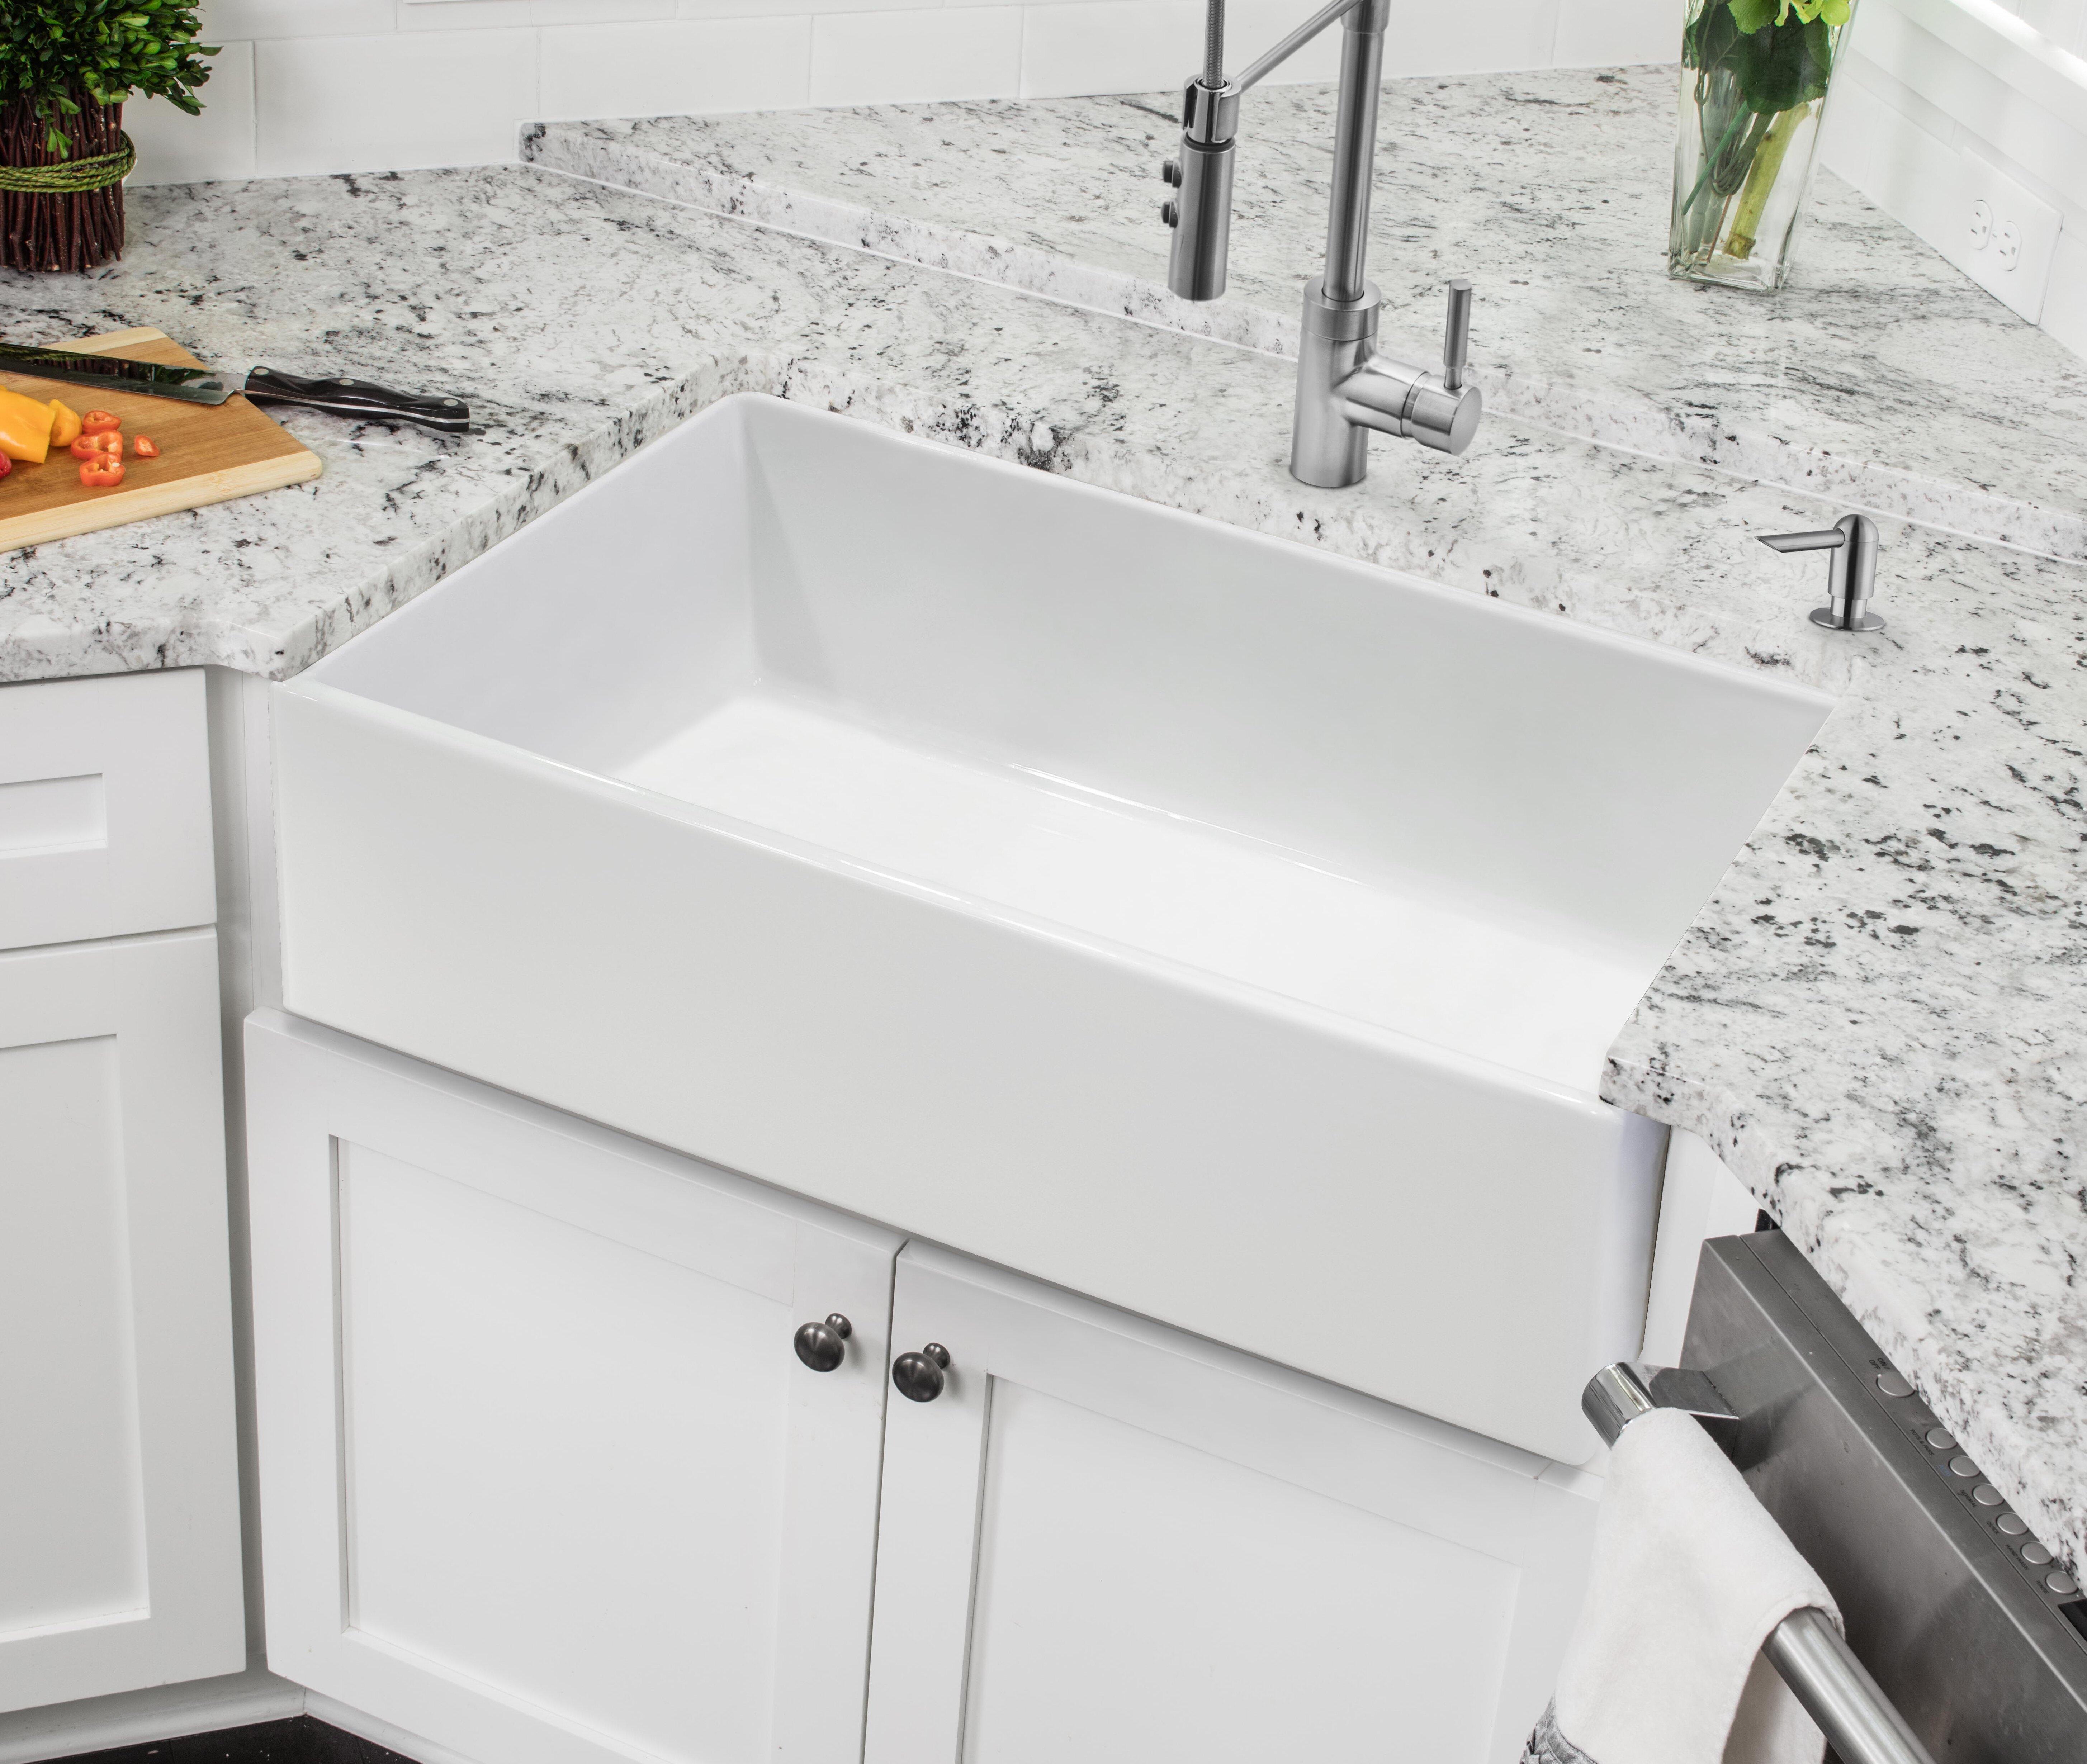 Soleil Fireclay 30 L X 18 W Farmhouse A Kitchen Sink